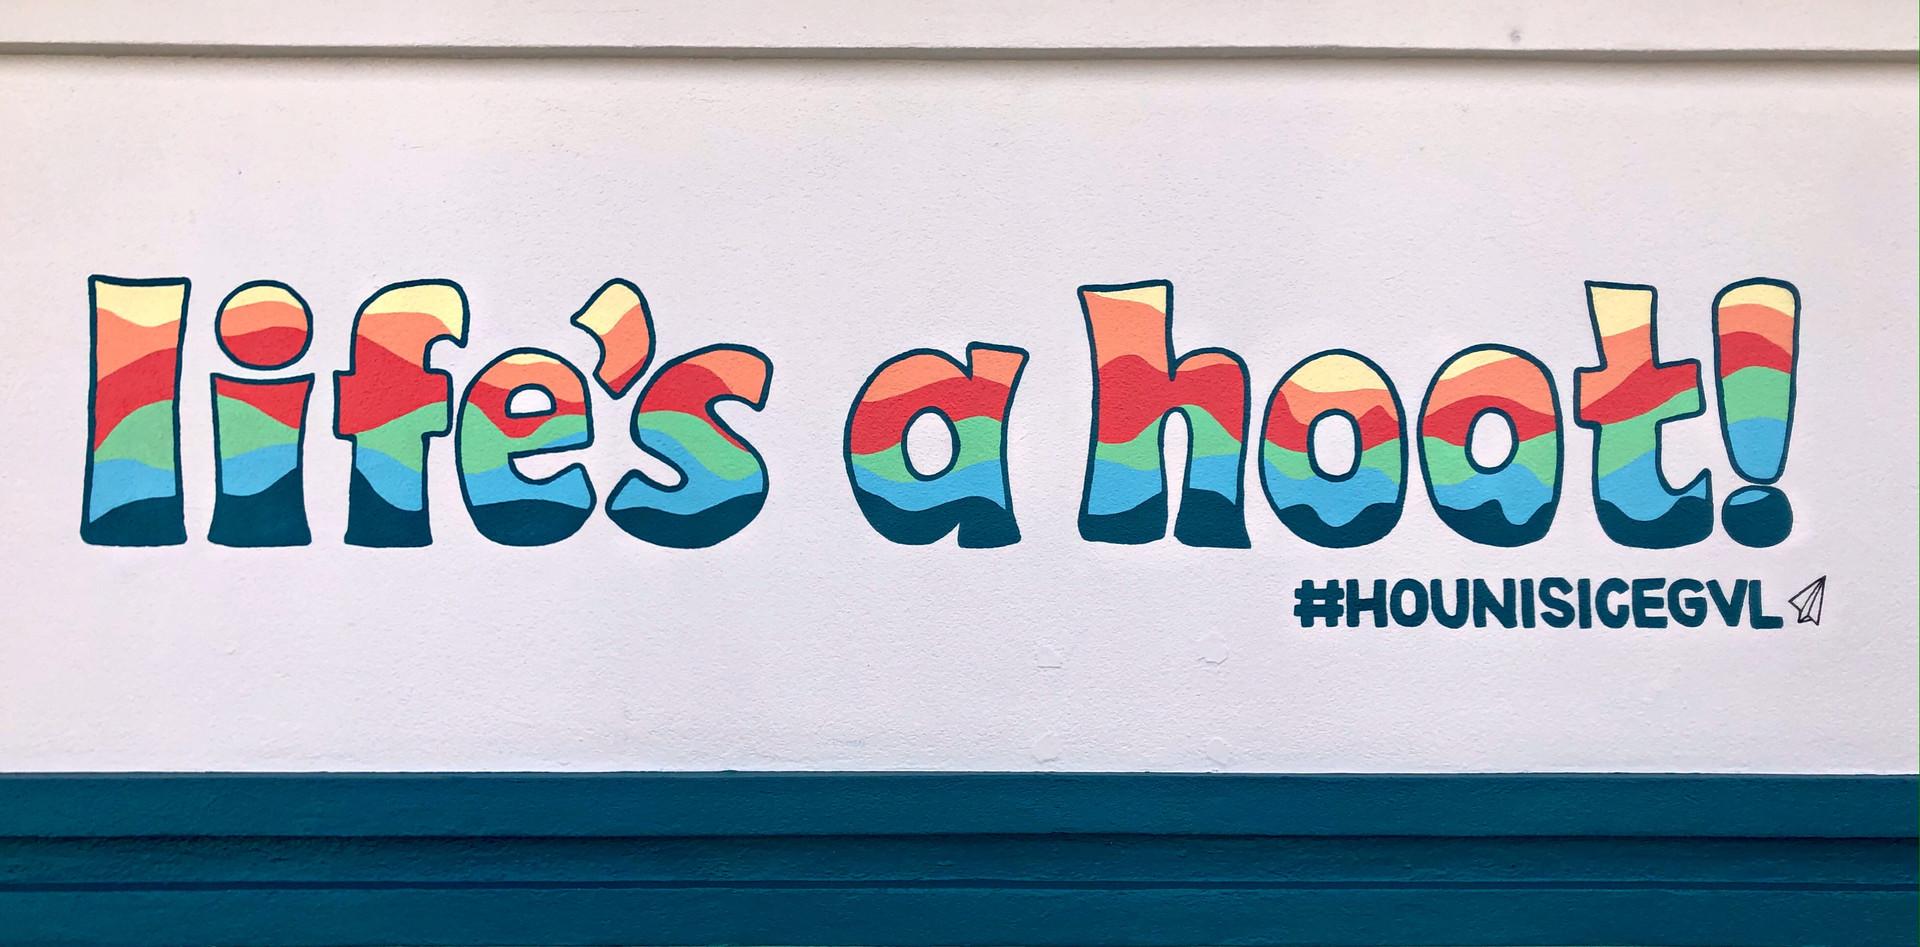 LIFE'S A HOOT!